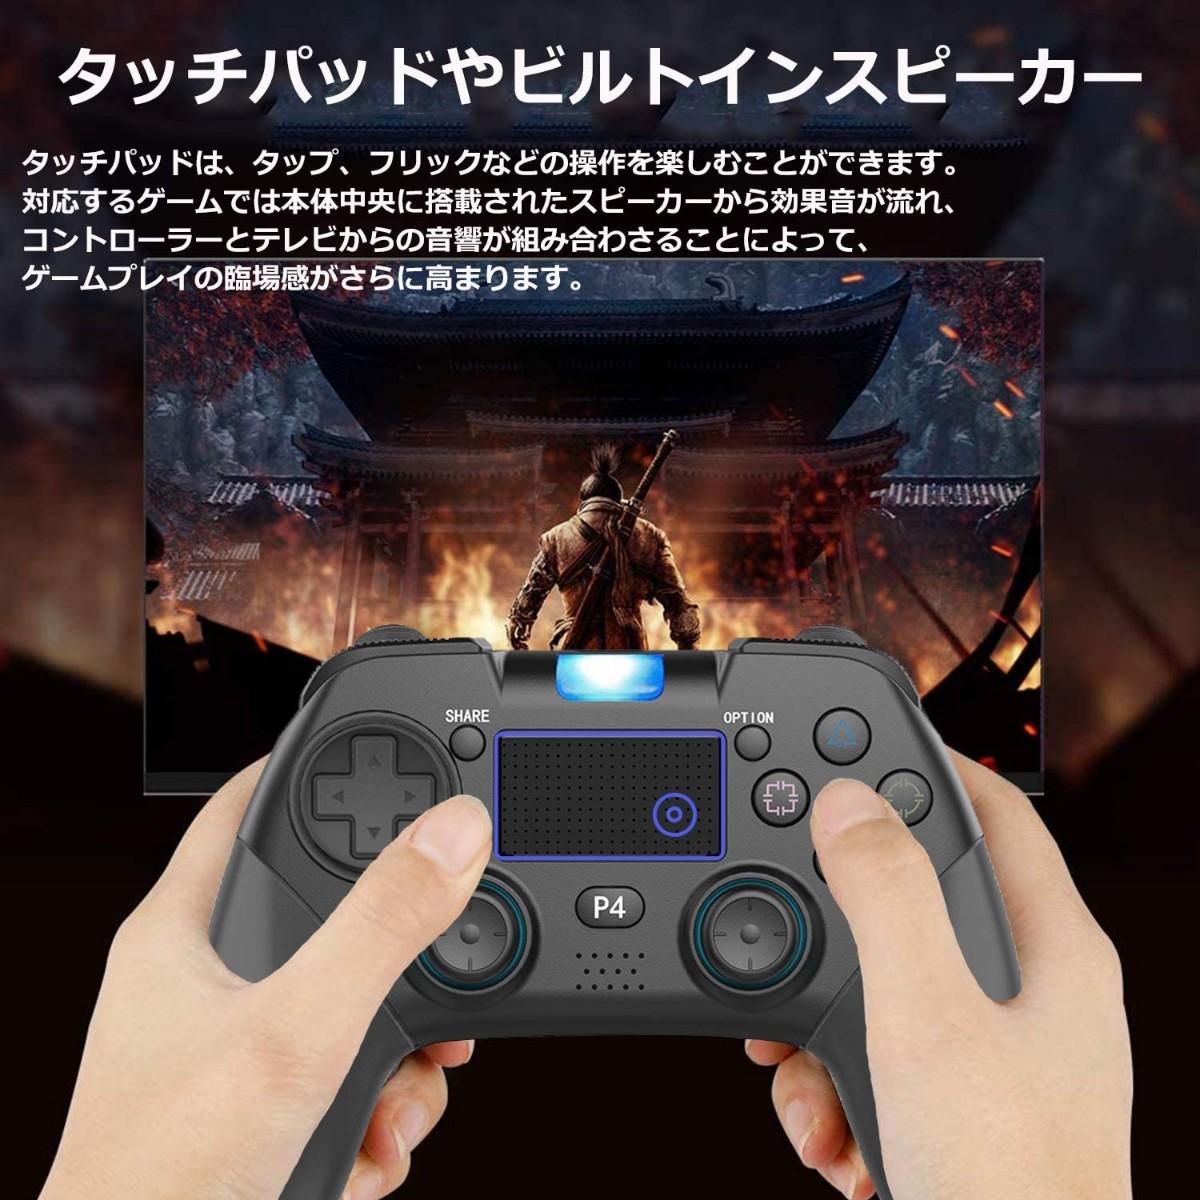 PS4 コントローラー 無線 Bluetooth接続